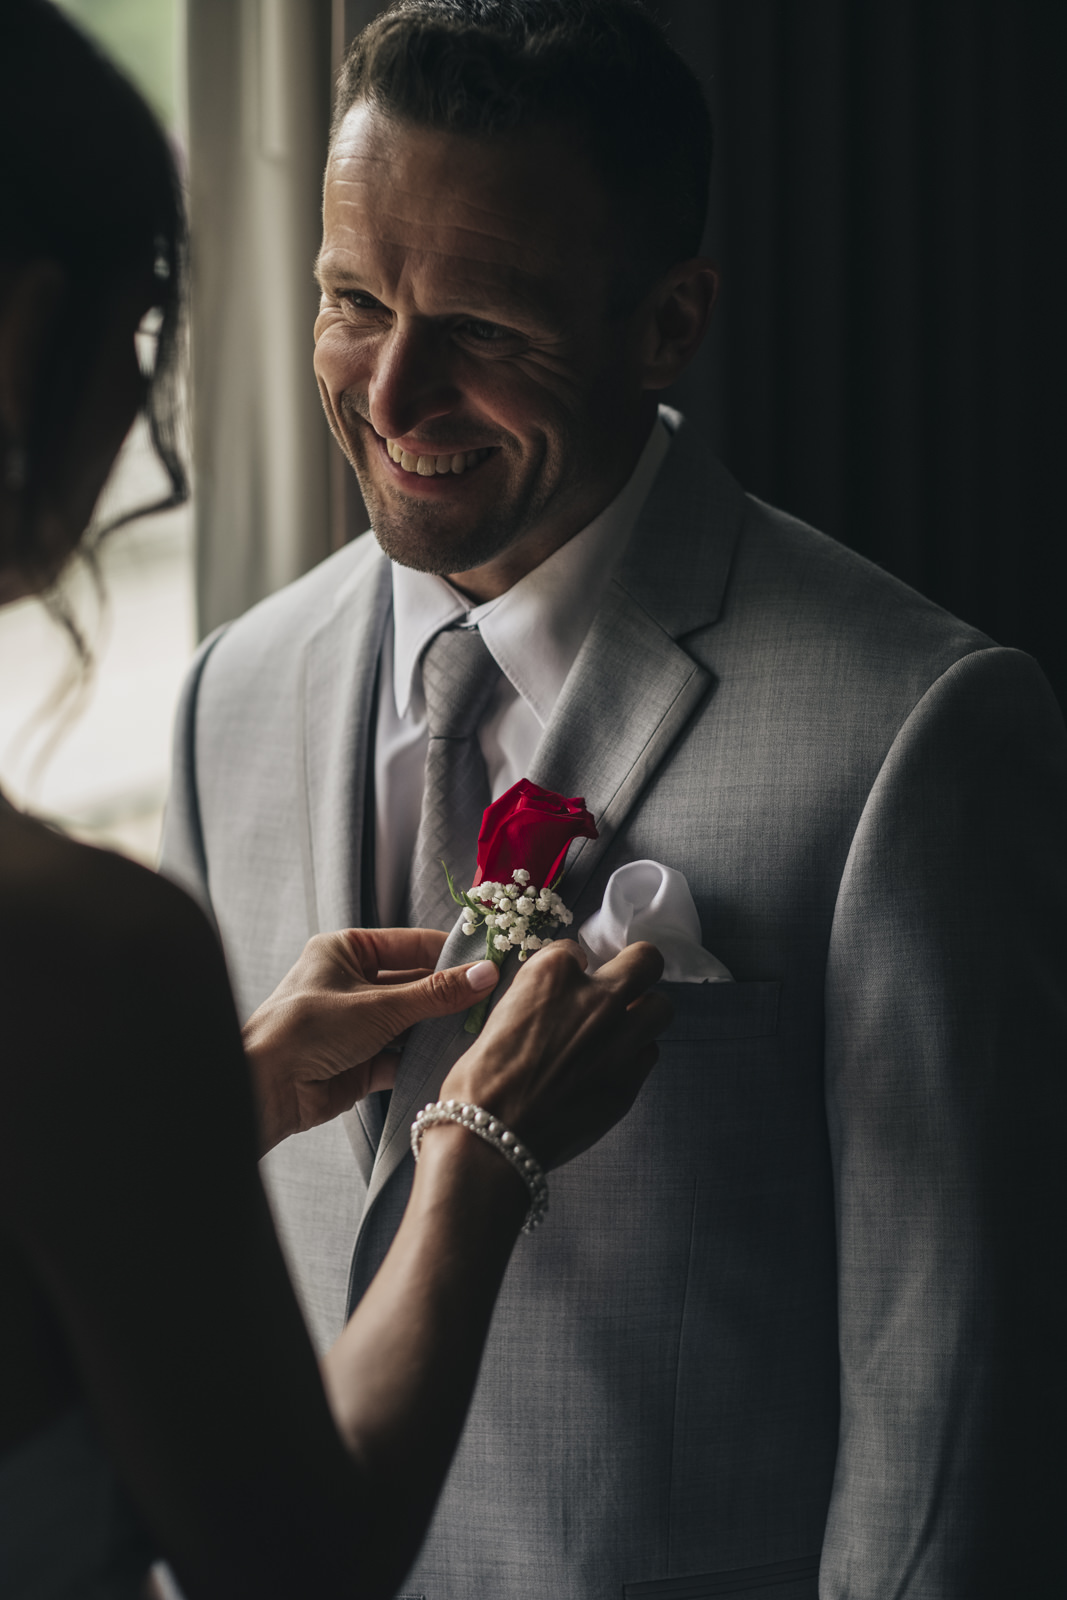 Bride helps groom get ready before their elopement.